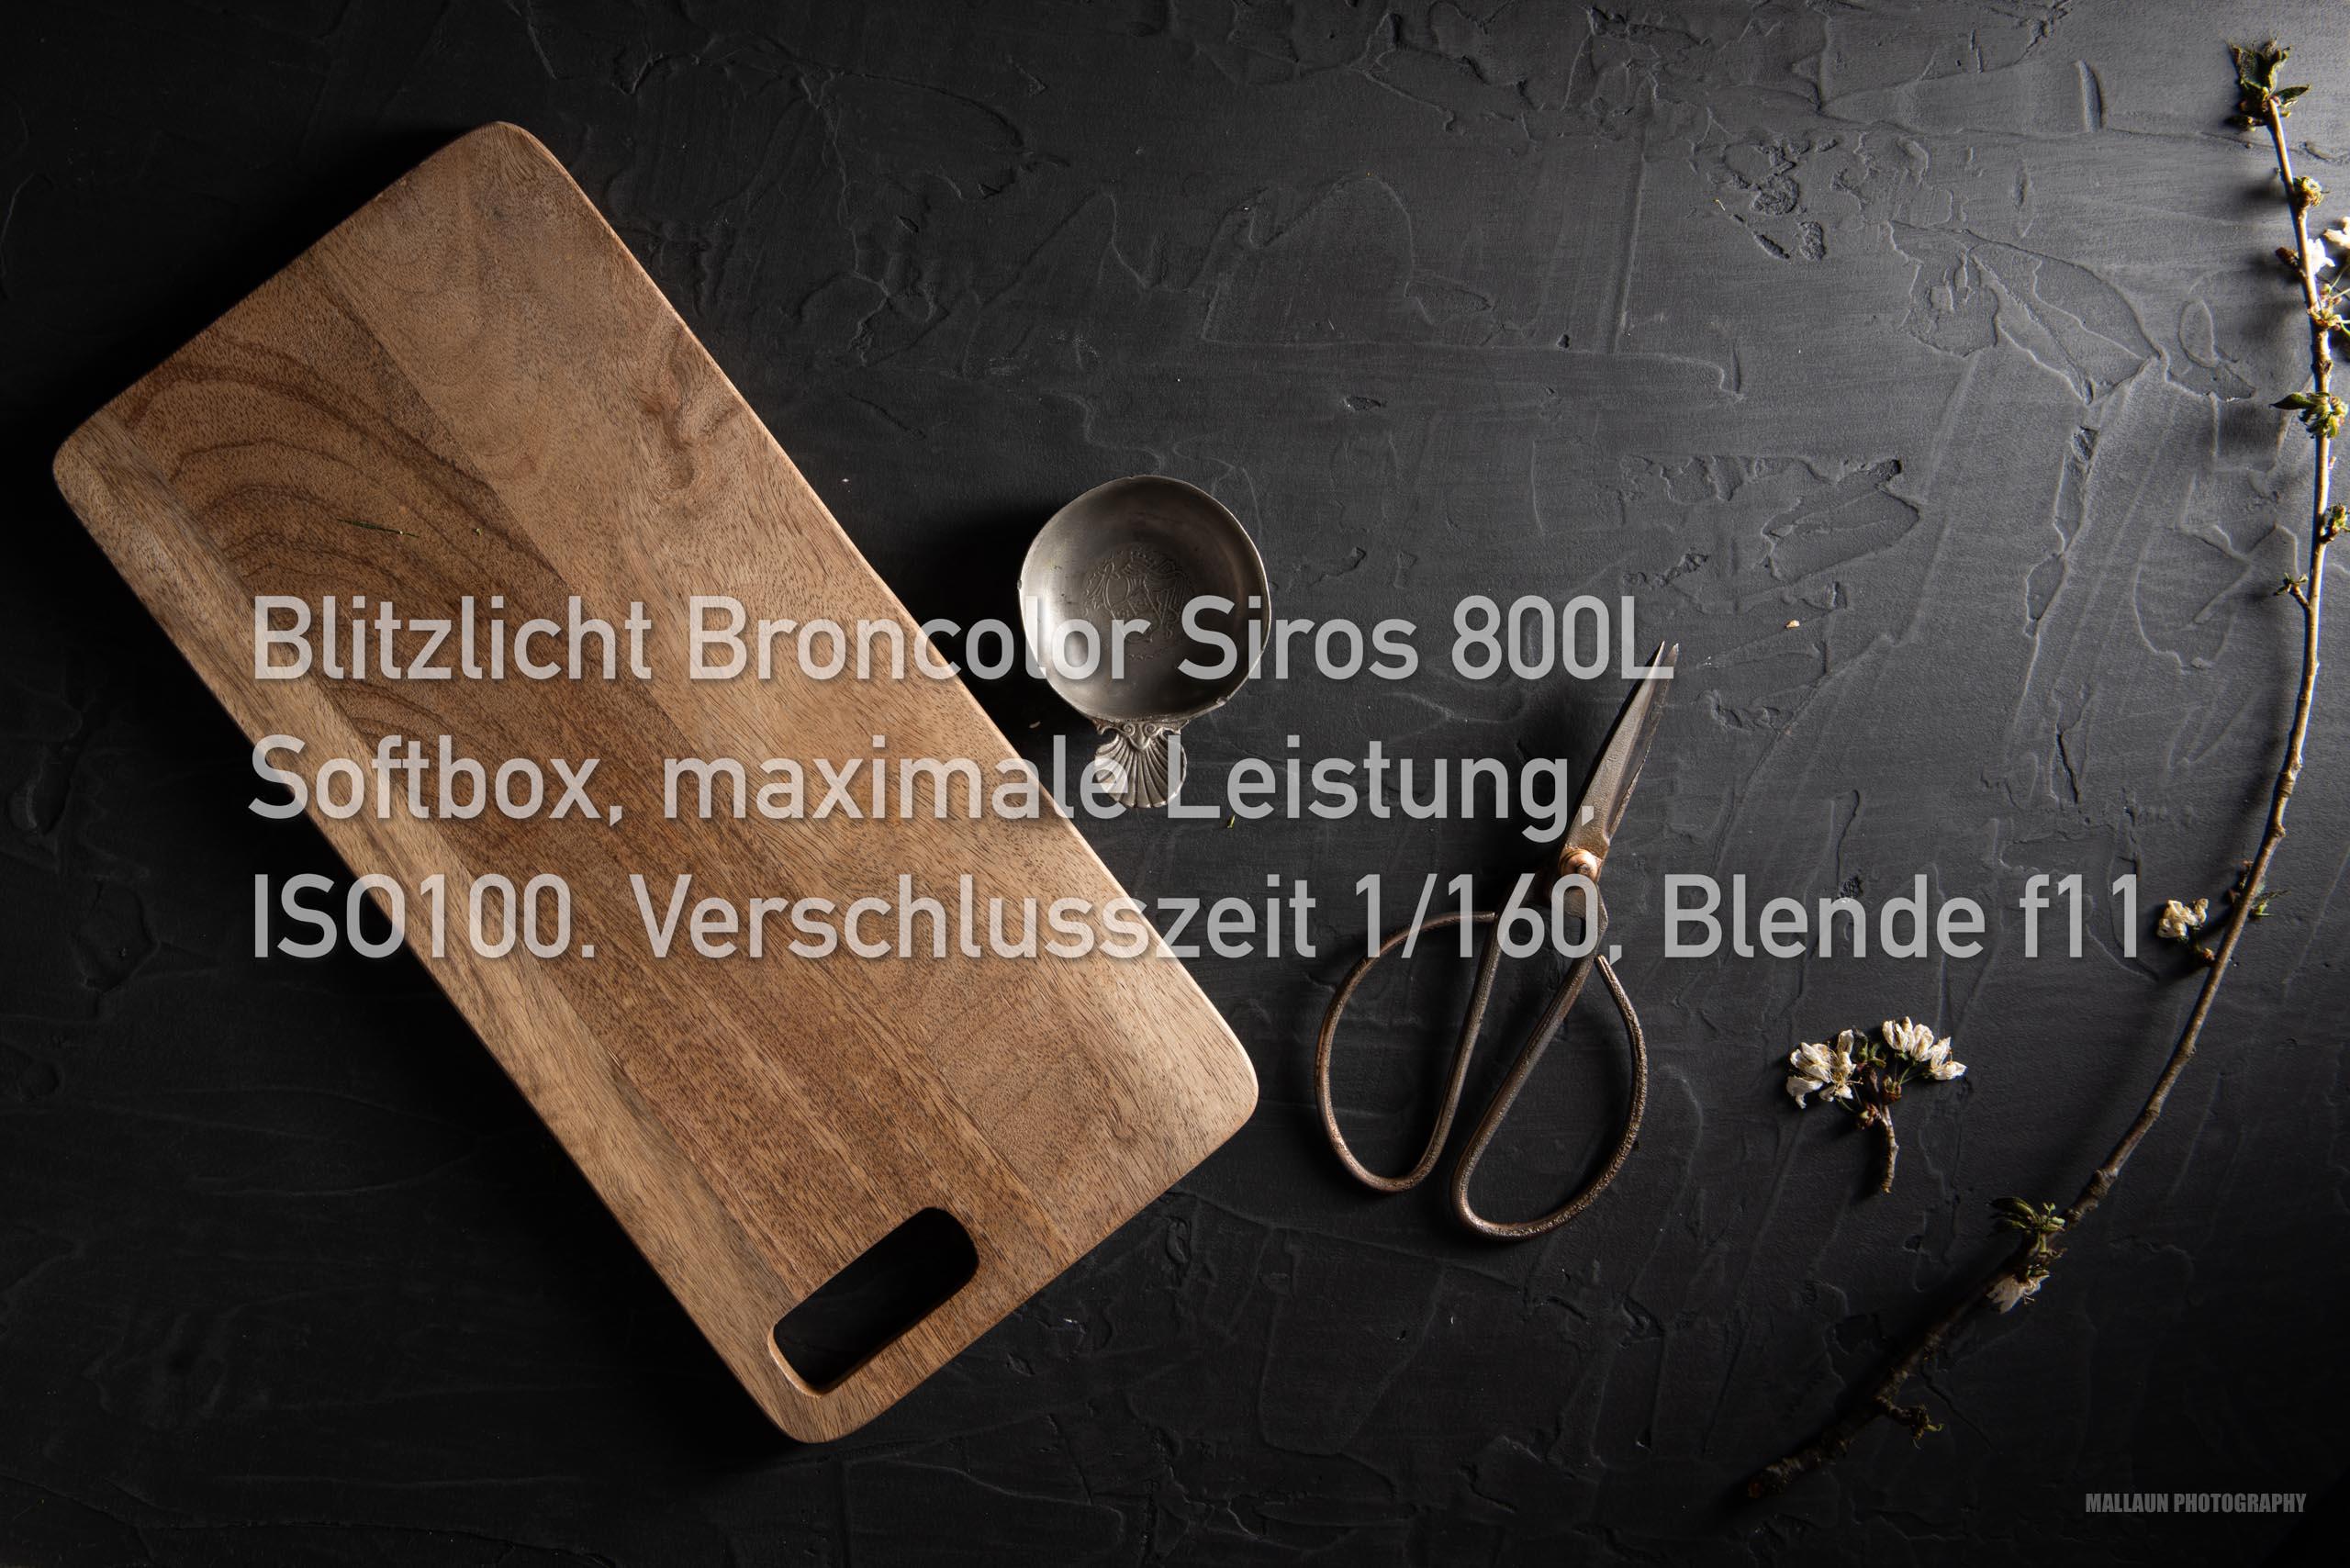 Blitzlicht Broncolor Siros 800L mit Softbox, maximale Leistung, 1/160, f11, ISO100